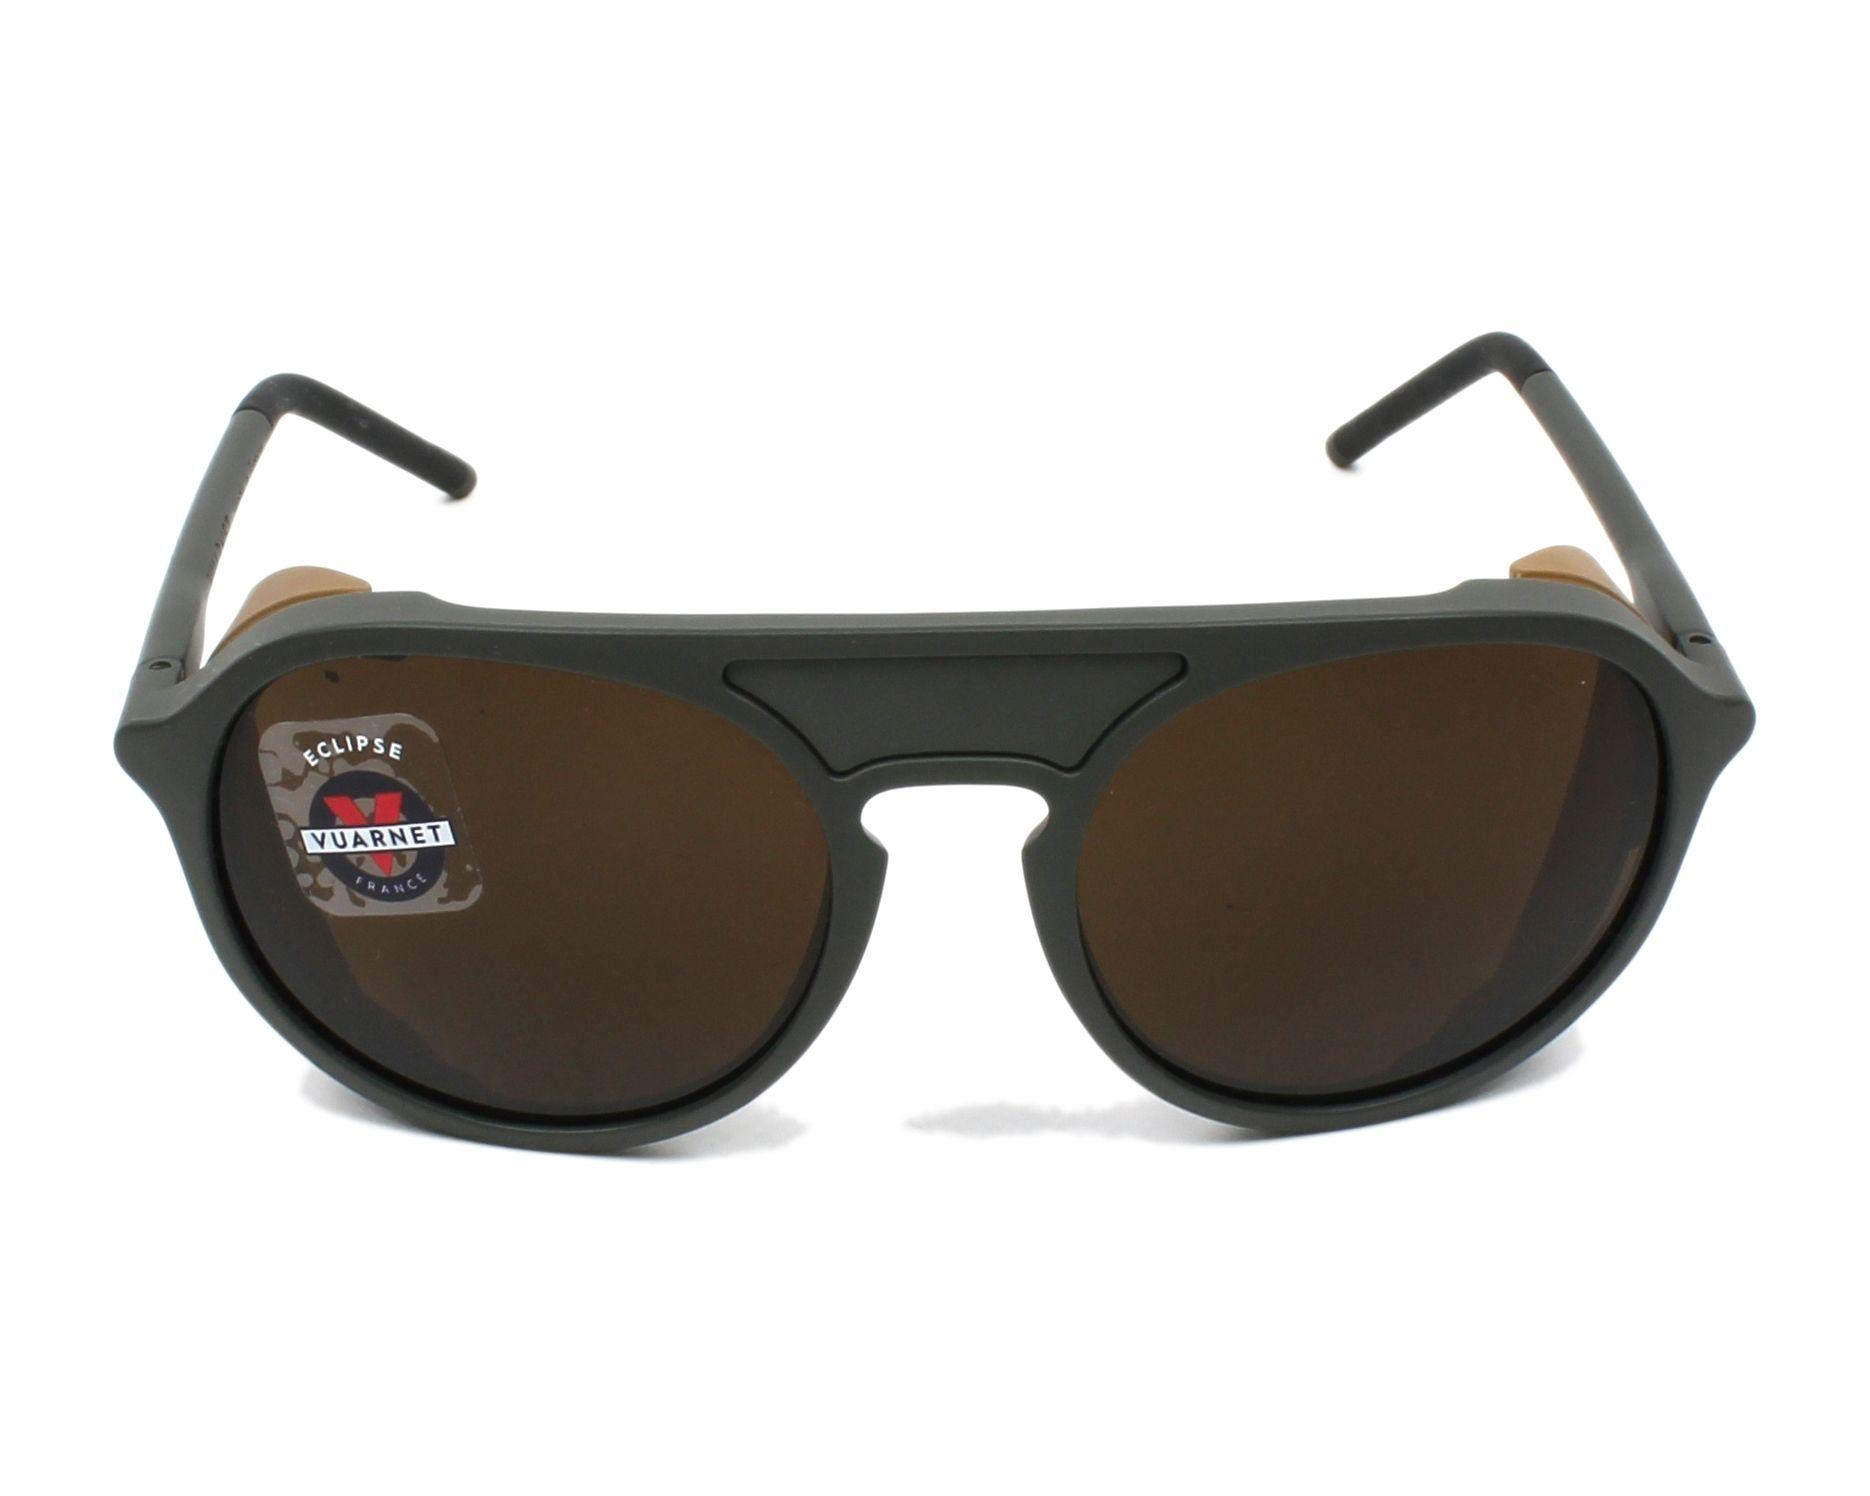 7e92c2b8fcf thumbnail Sunglasses Vuarnet VL-1709 0004-2182 51-18 Green front view